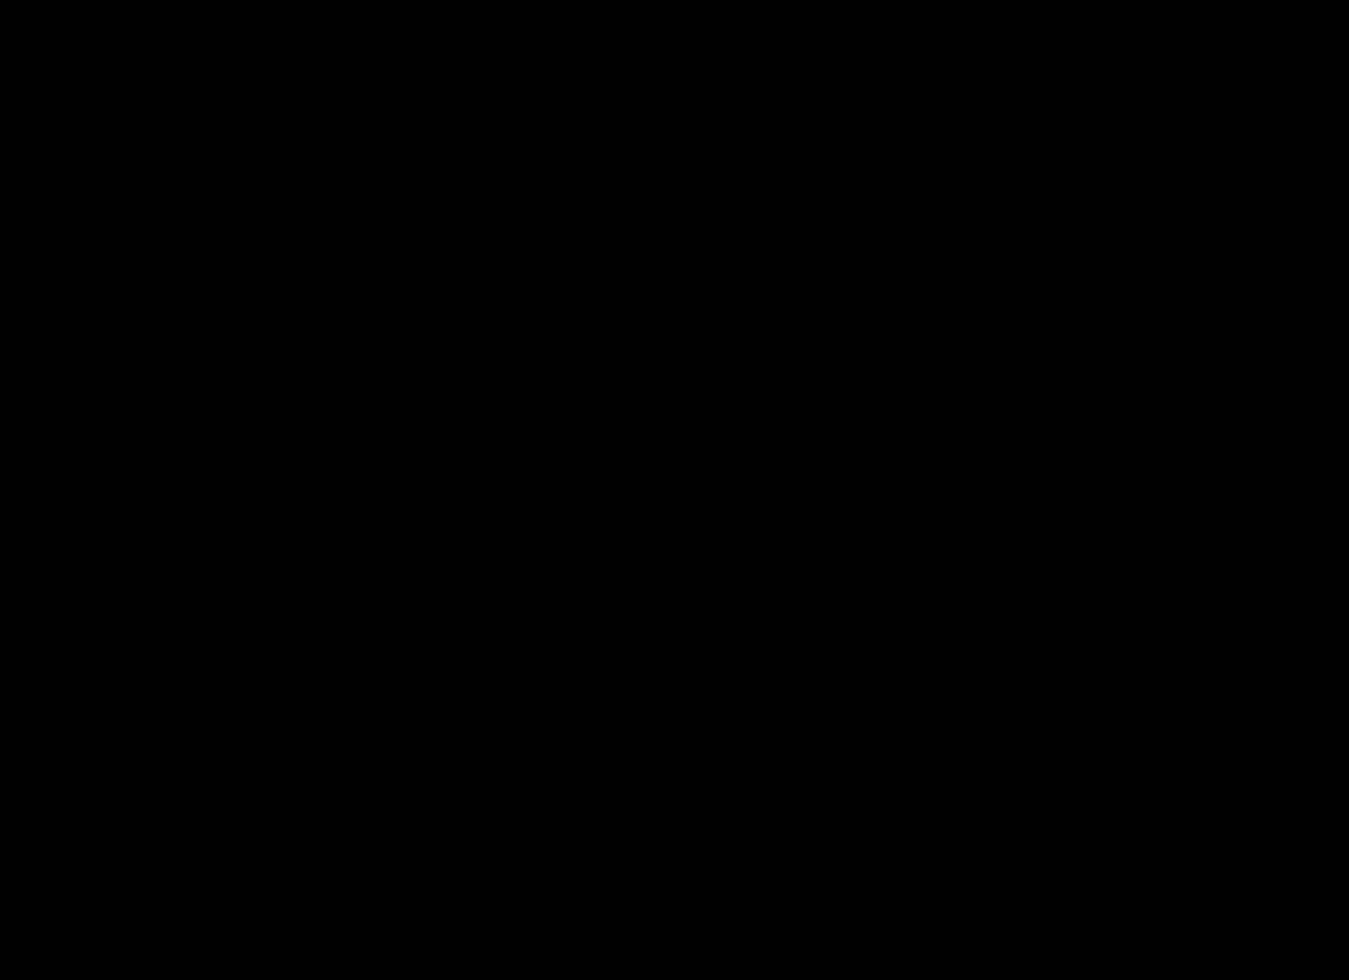 strumento musicale in ottone png